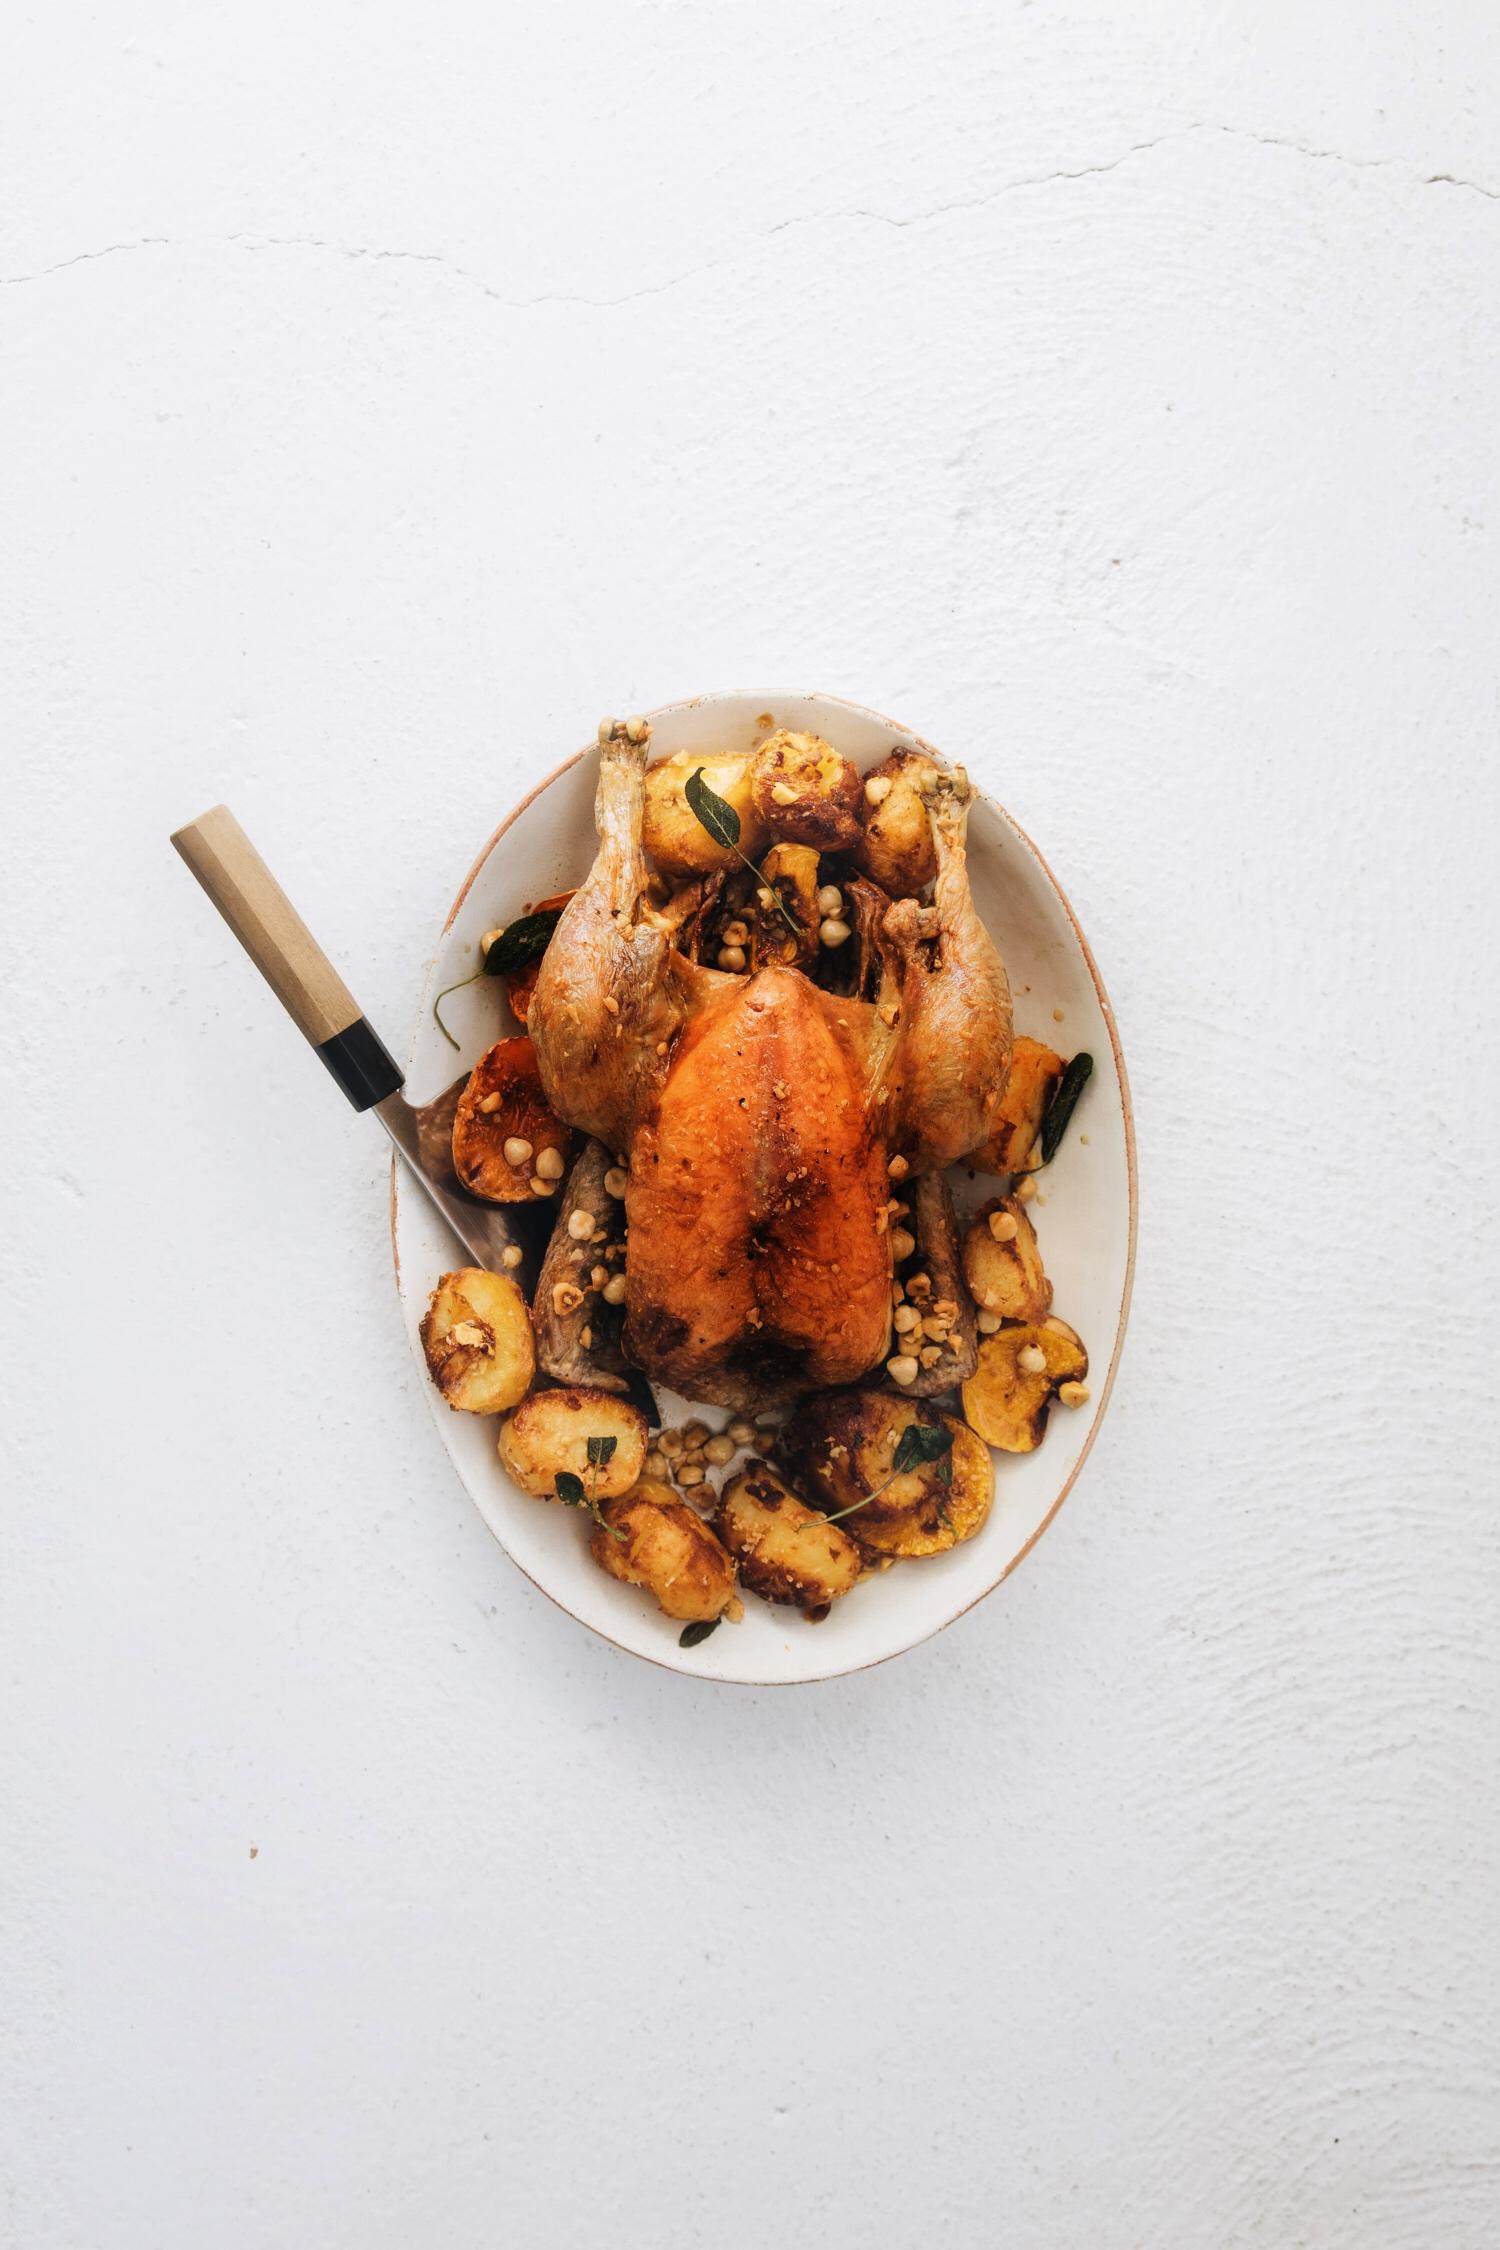 Chicken with sage and hazelnut butter